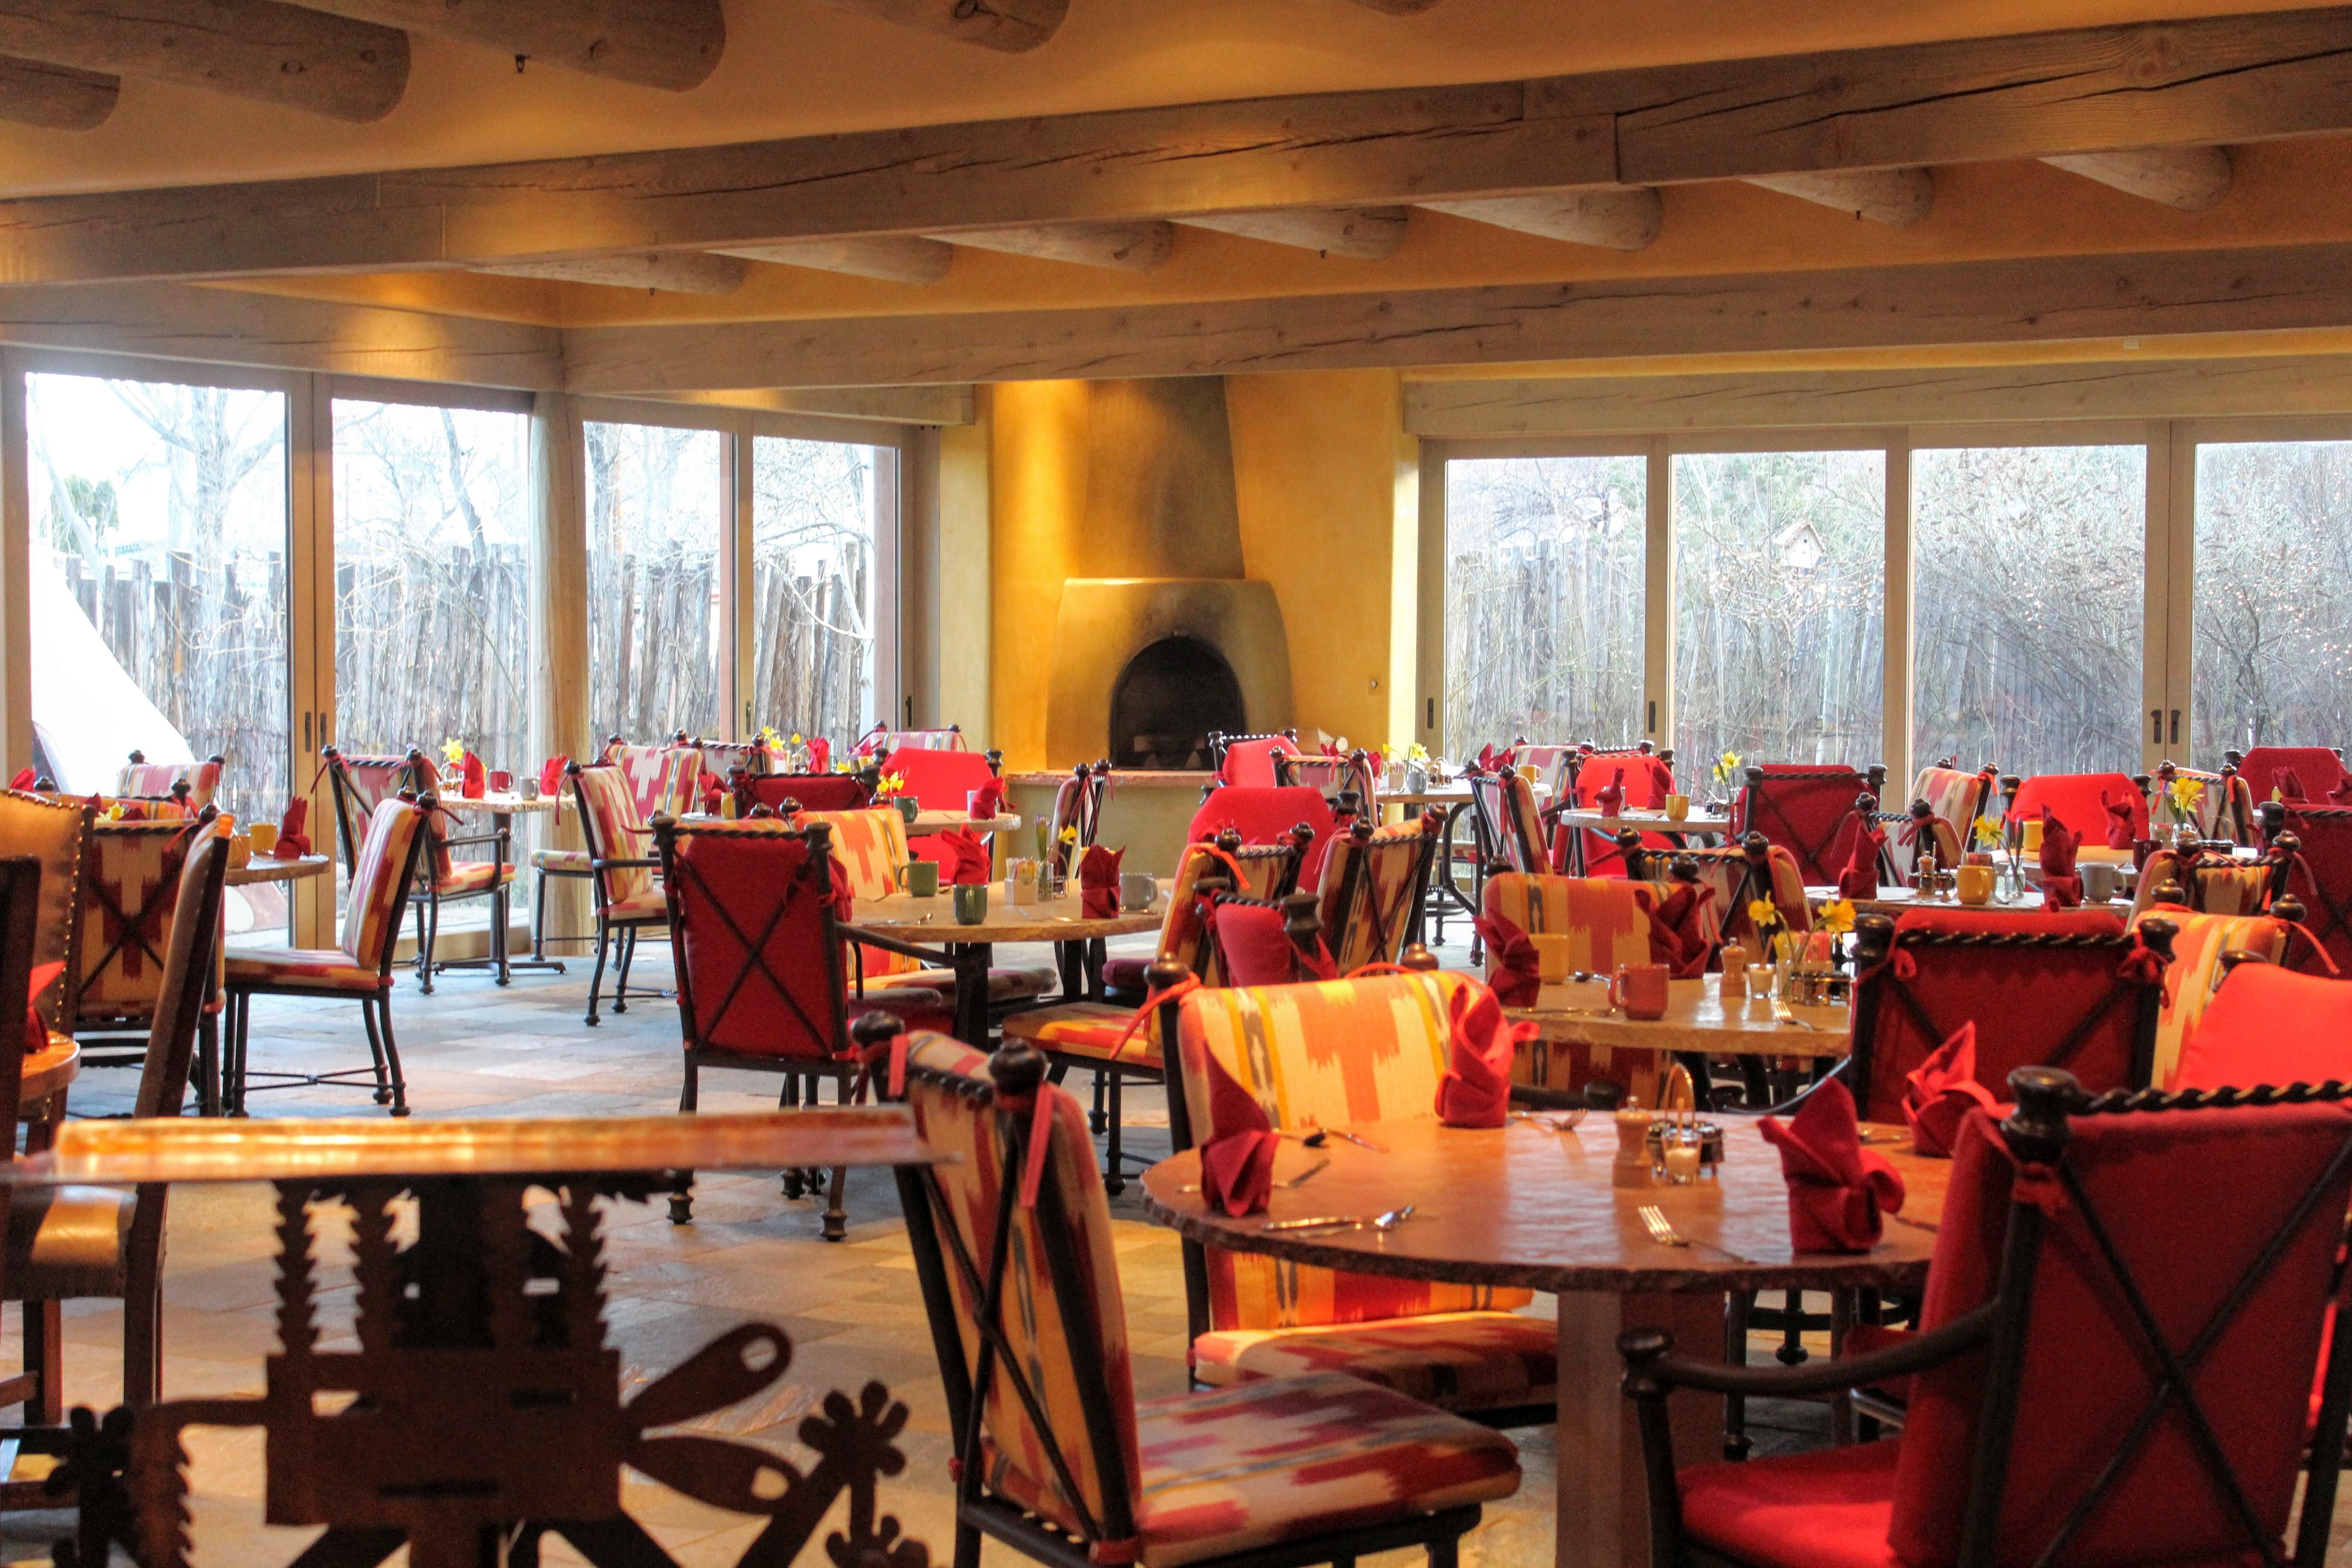 Best Hotel in Santa Fe? Check out Amaya.